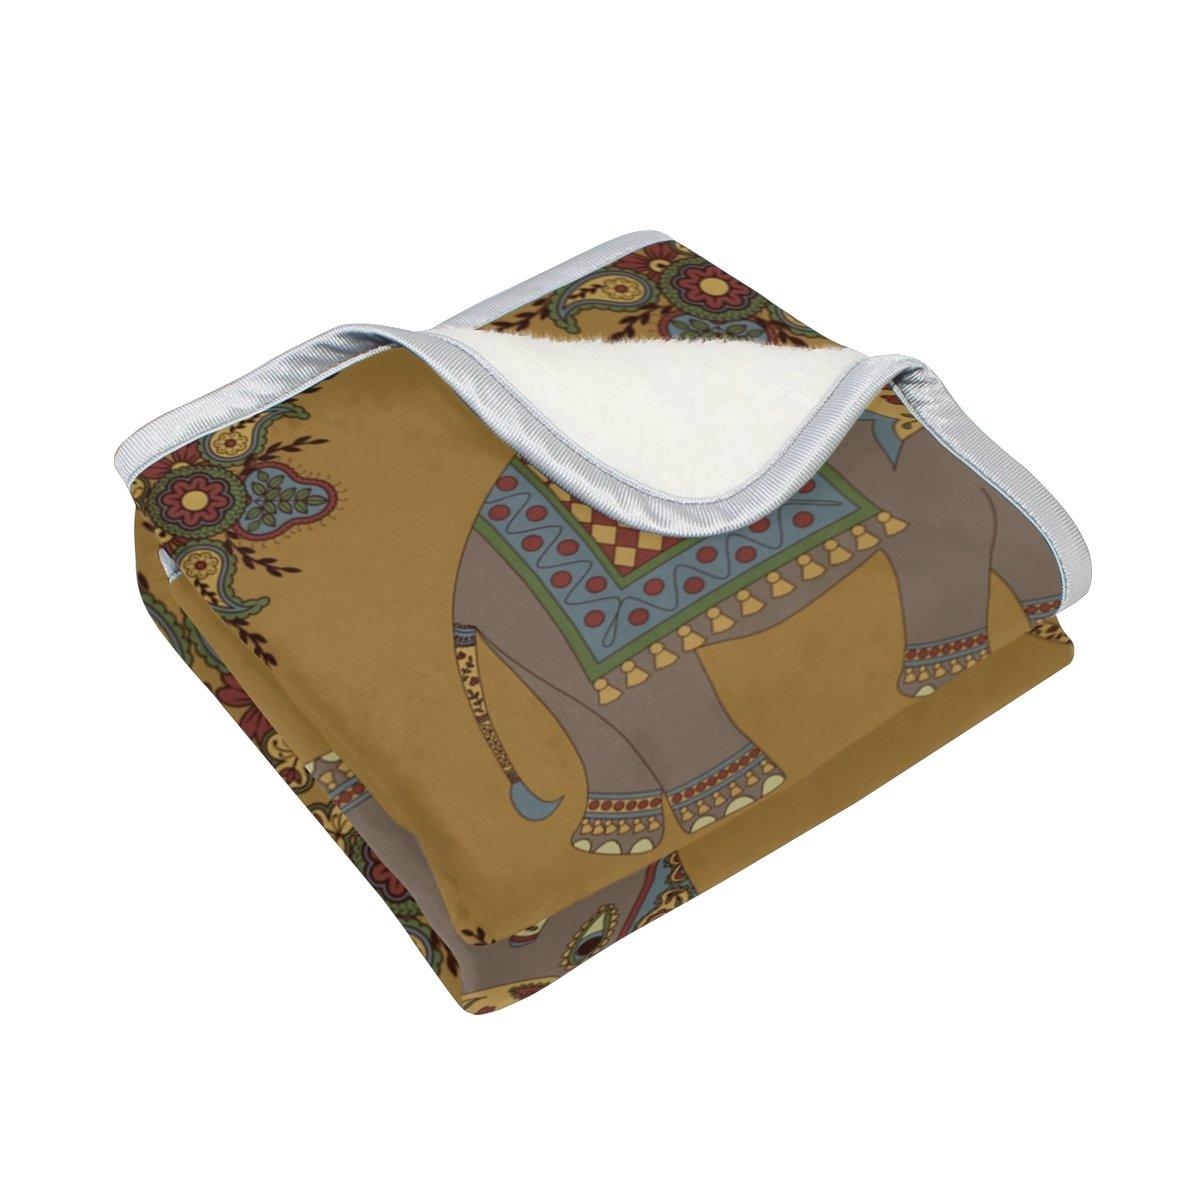 Vantaso Soft Blankets Throw India Mandala Elephants Microfiber Polyester Blankets for Bedroom Sofa Couch Living Room for Kids Children Girls Boys 60 x 90 inch by Vantaso (Image #2)